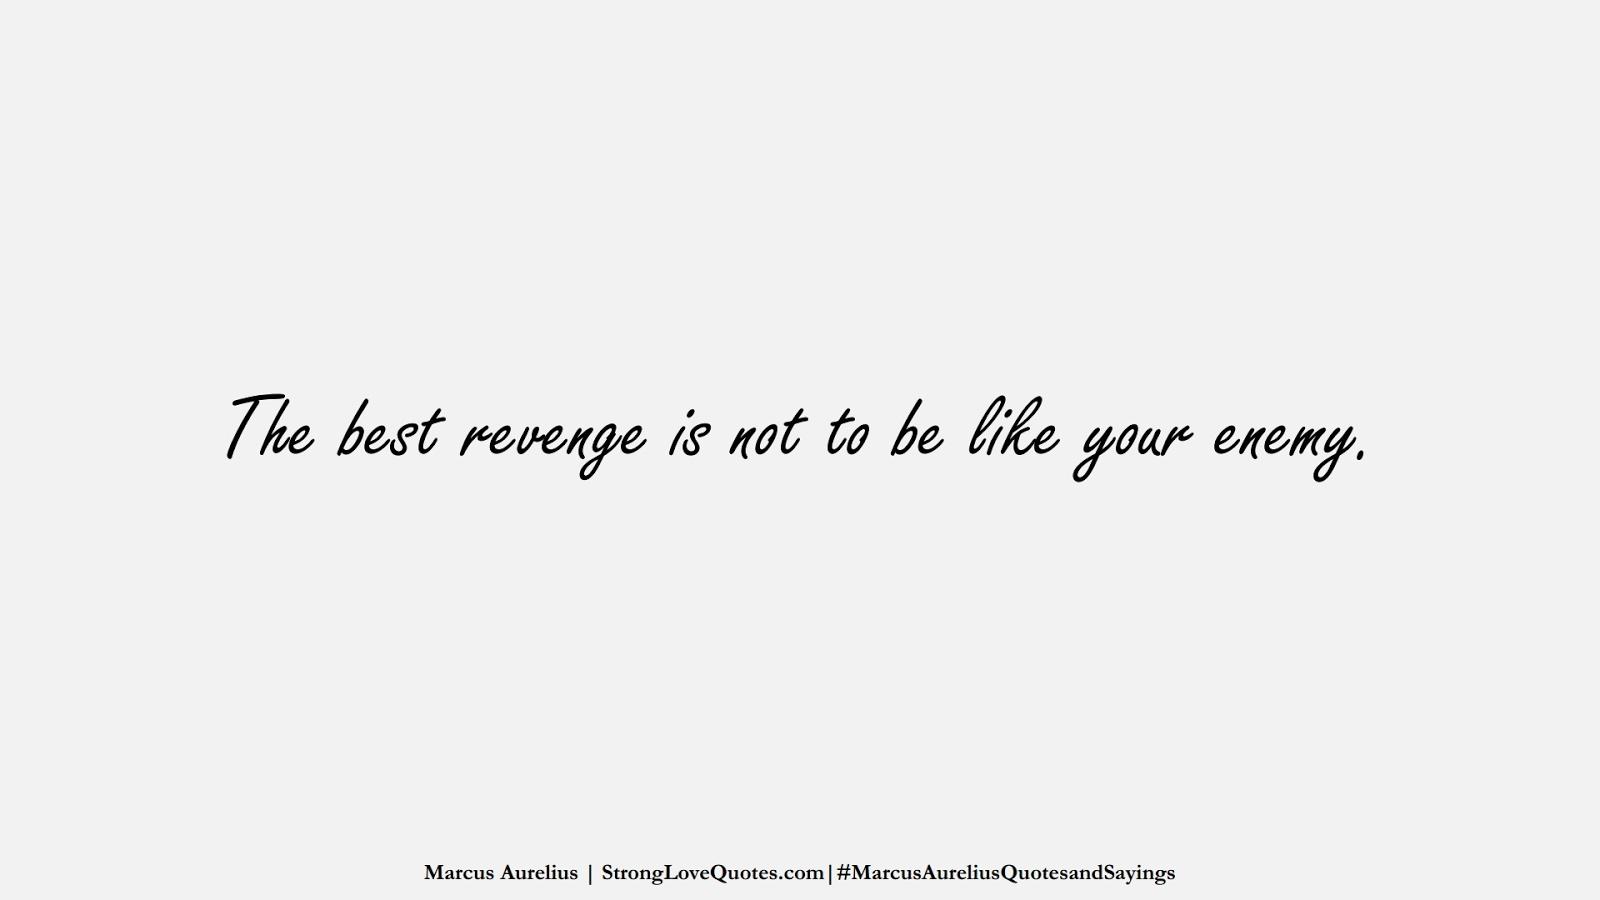 The best revenge is not to be like your enemy. (Marcus Aurelius);  #MarcusAureliusQuotesandSayings